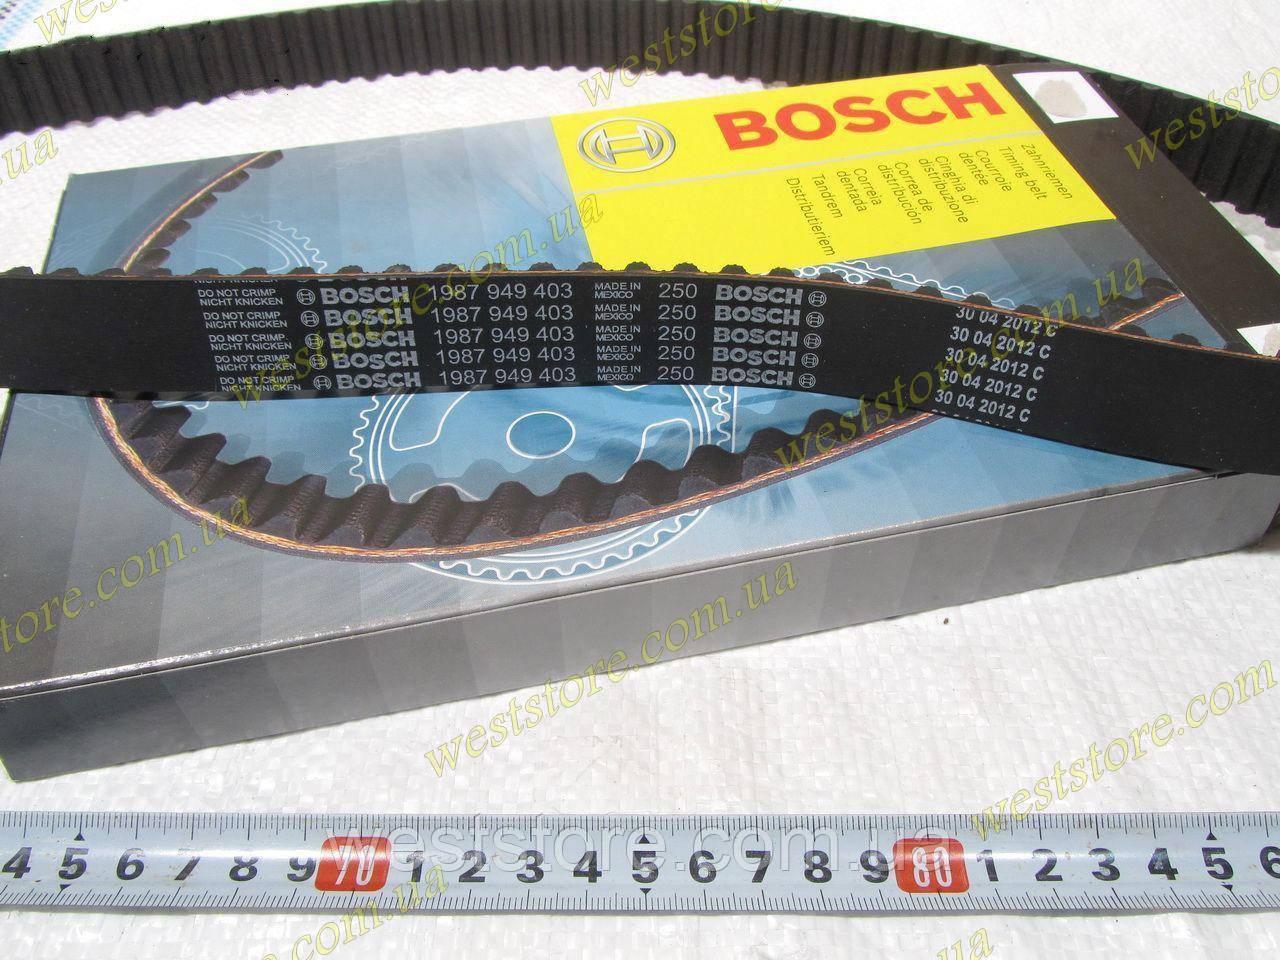 Ремень ГРМ (распредвала) Ланос Авео Lanos Aveo Lacetti 1.6 16V Bosch (Бош) 1987949403\96183352